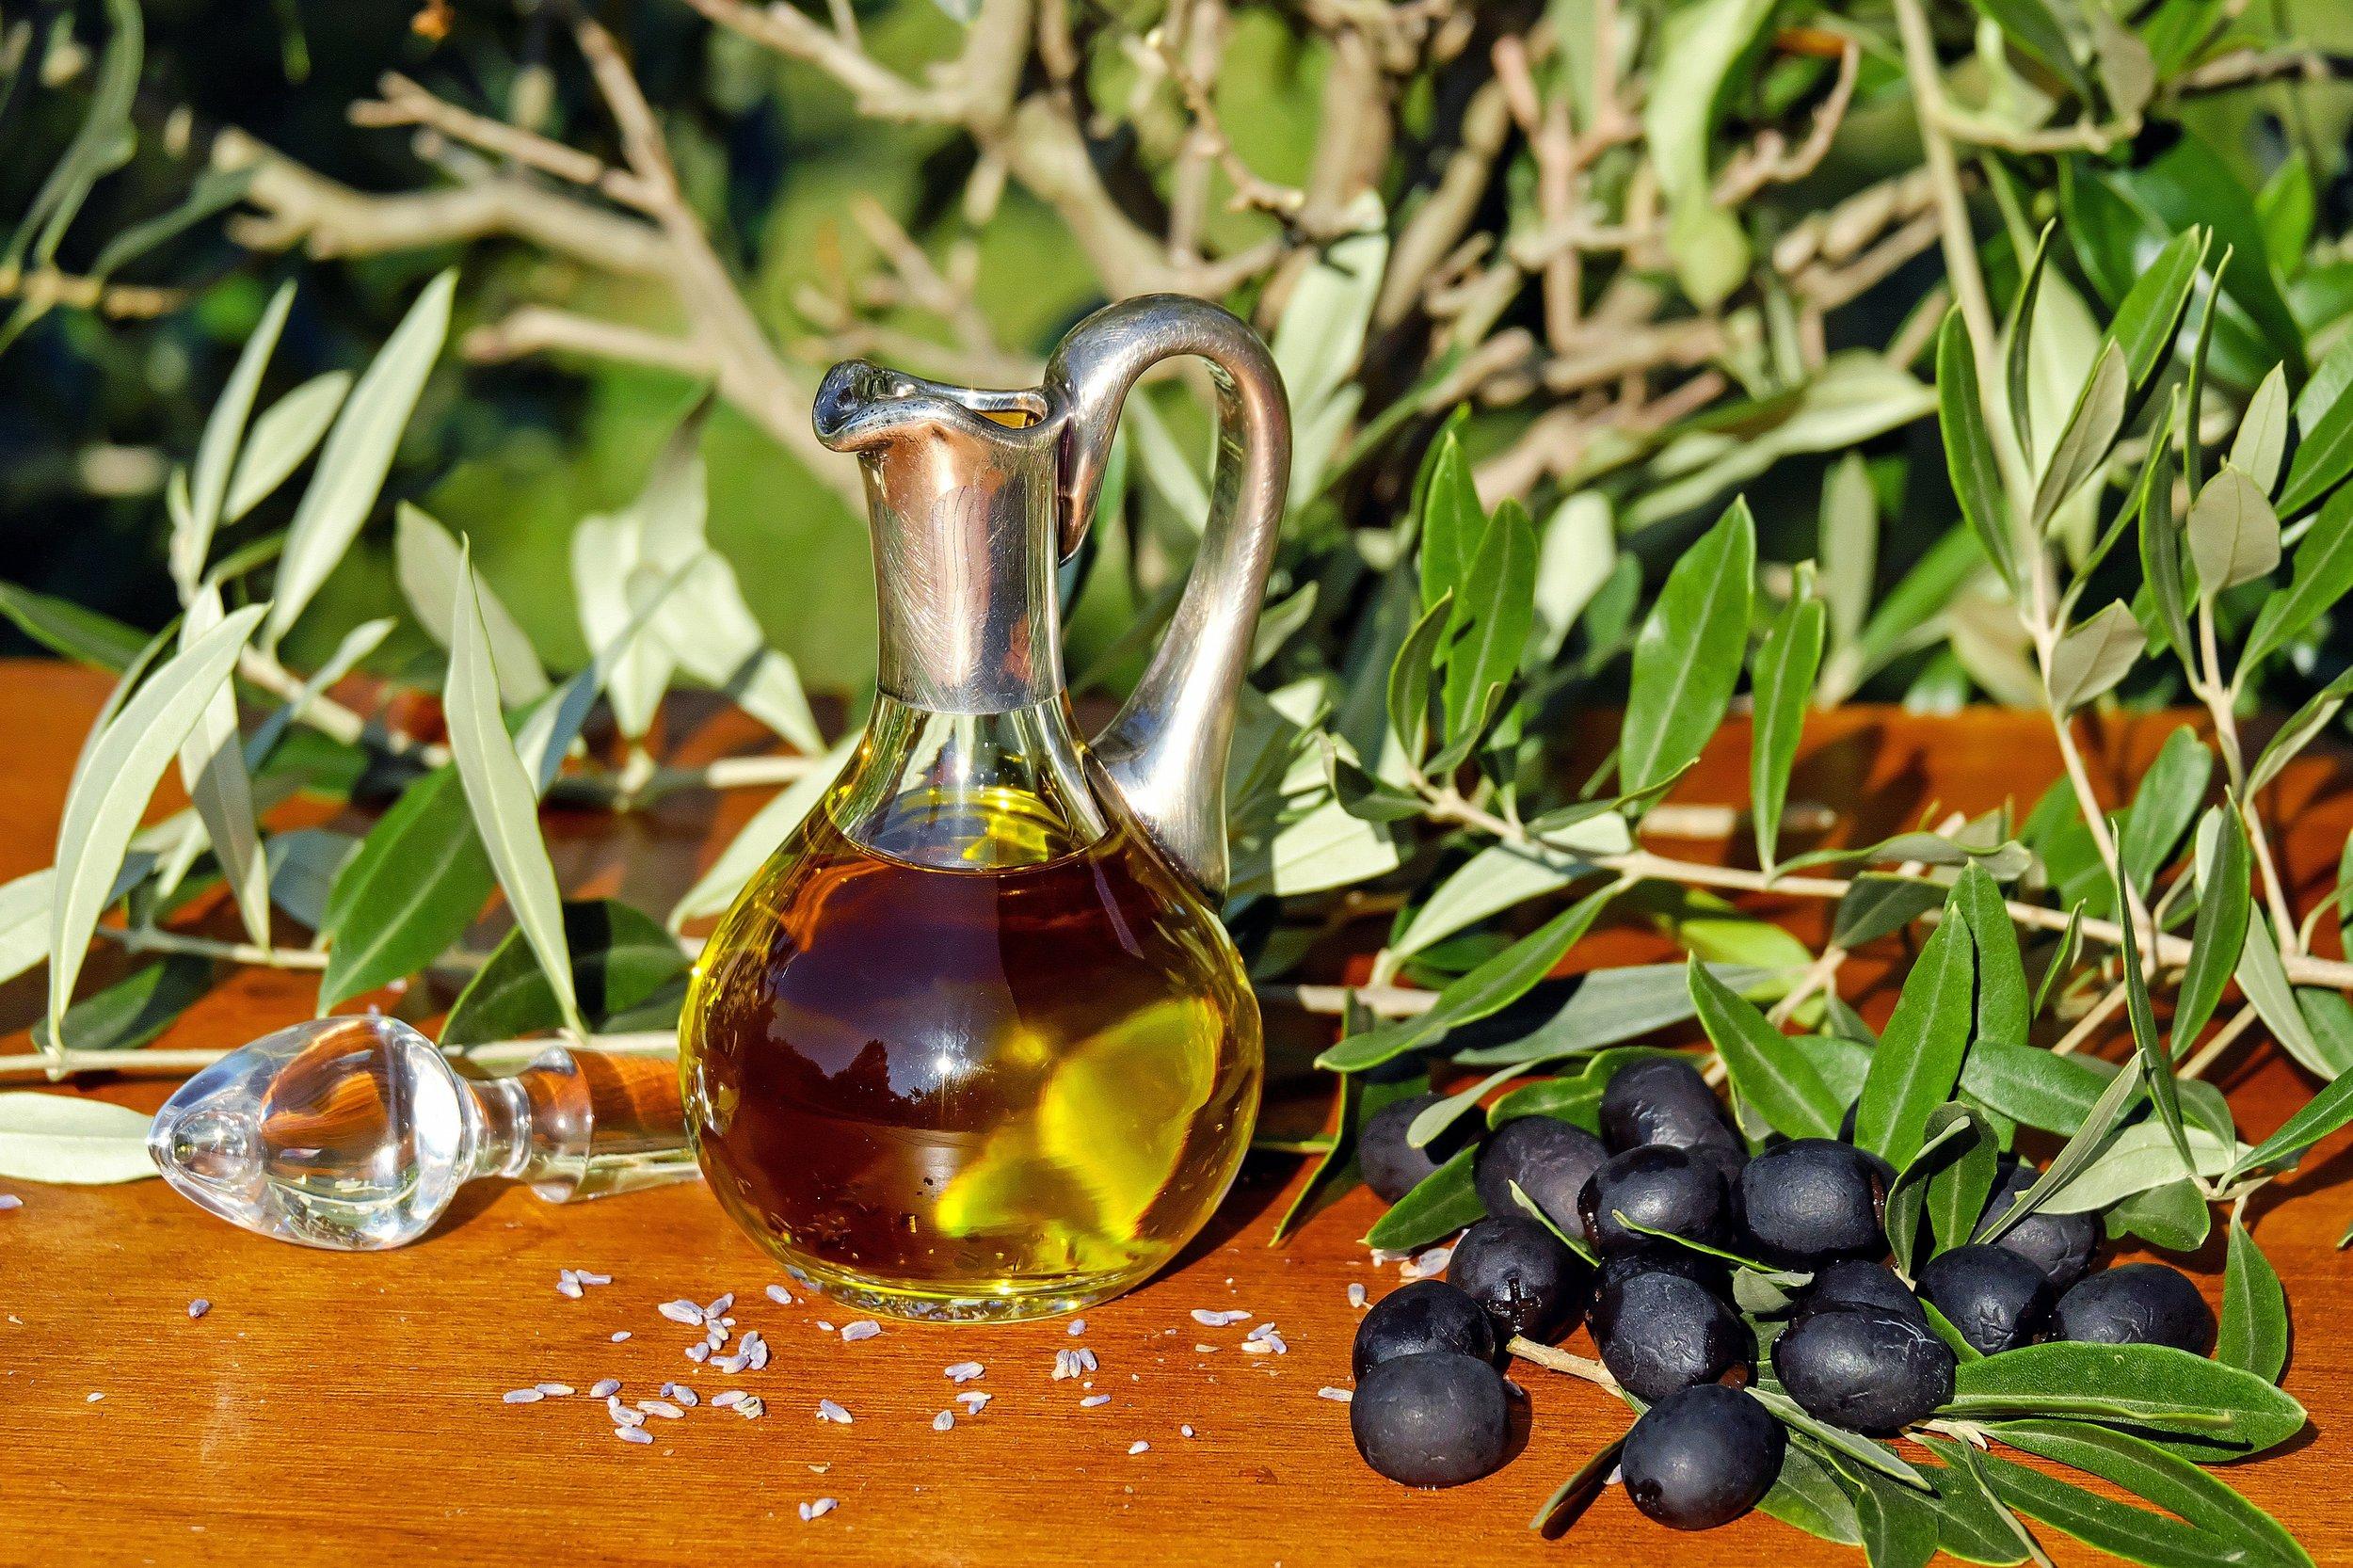 black-olives-blur-bottle-162667.jpg